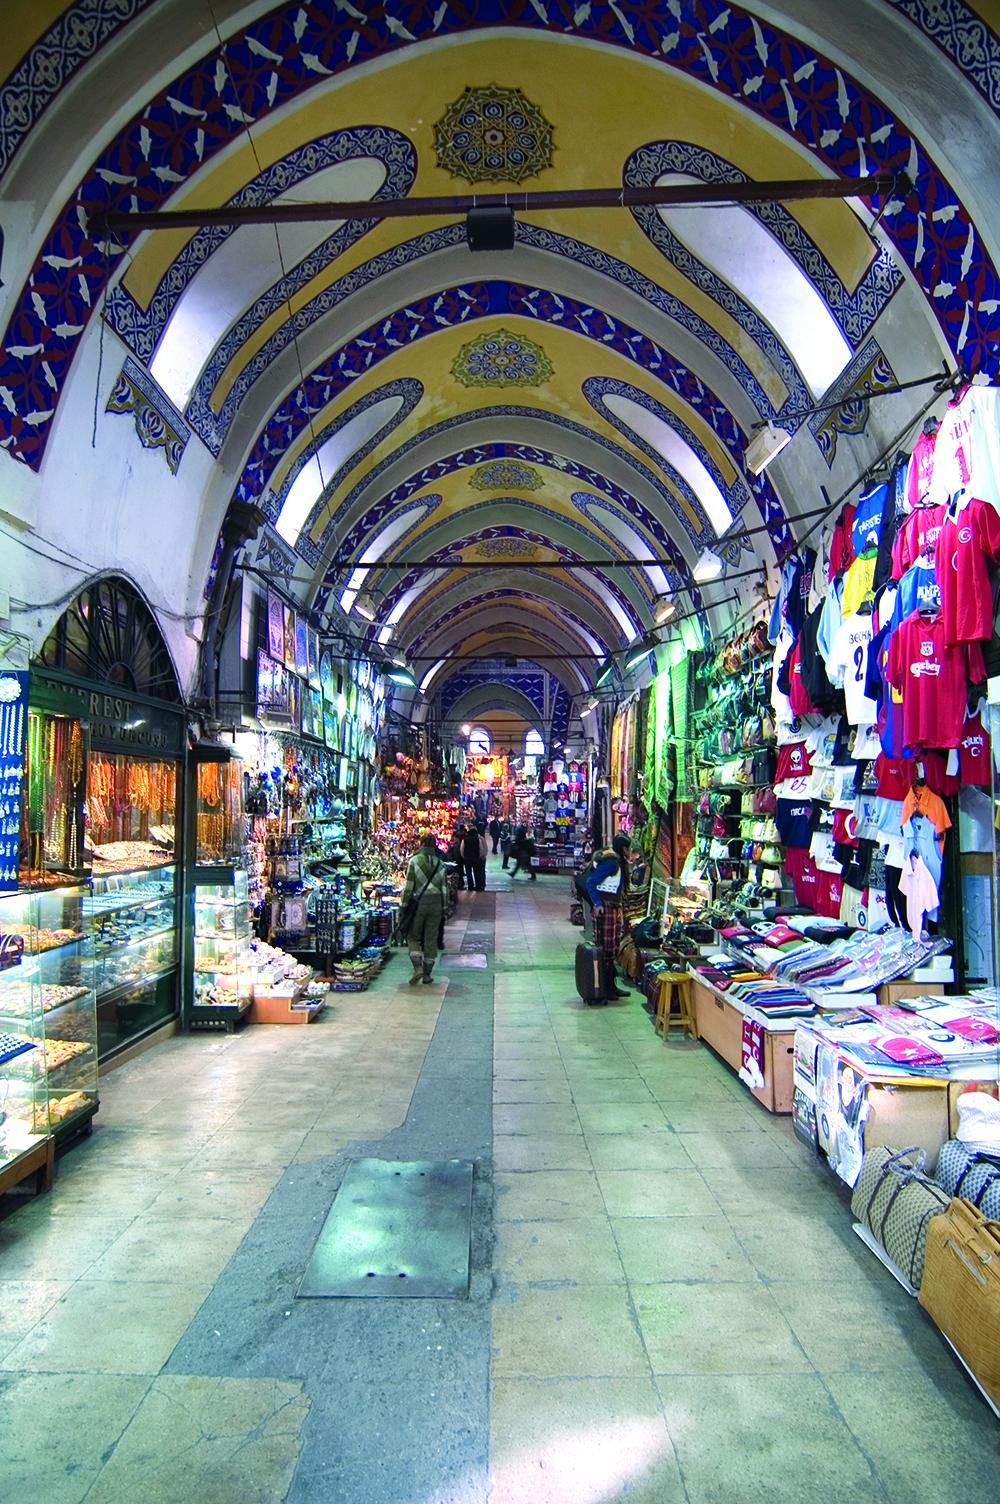 37-The Grand Bazaar.jpg